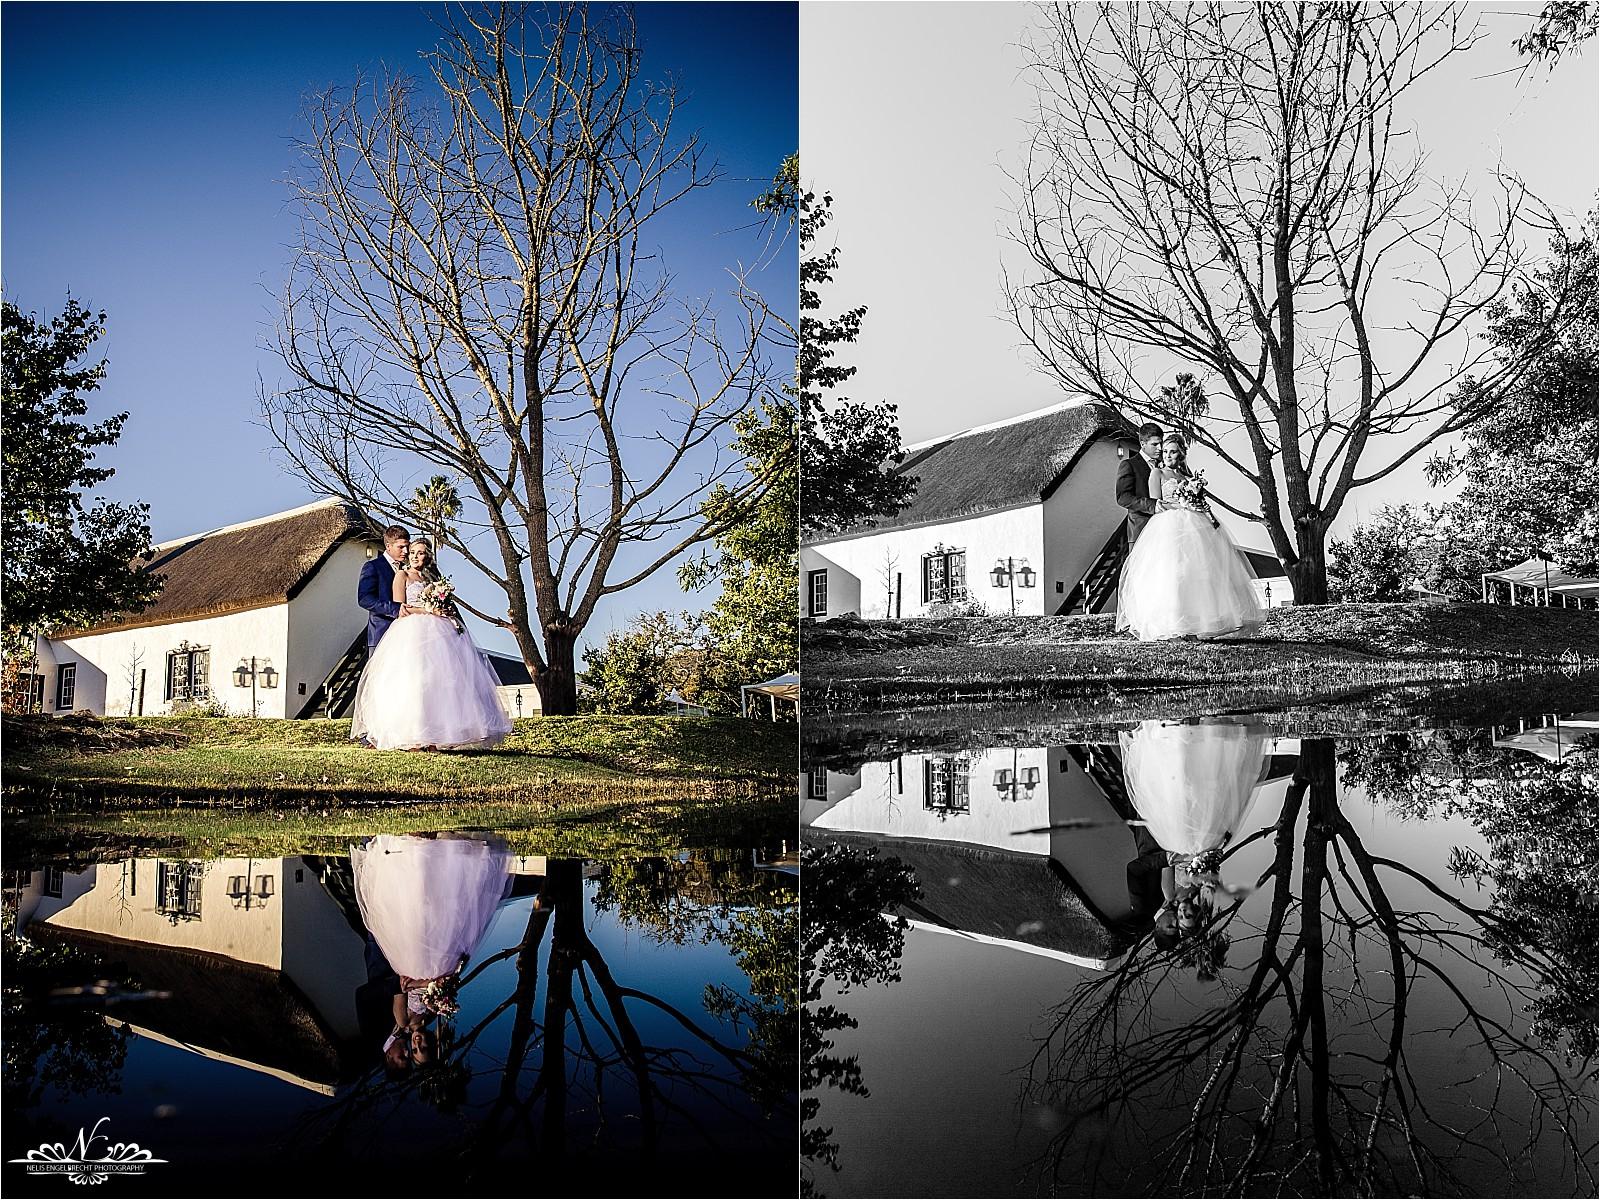 nelis-engelbrecht-photography-1071